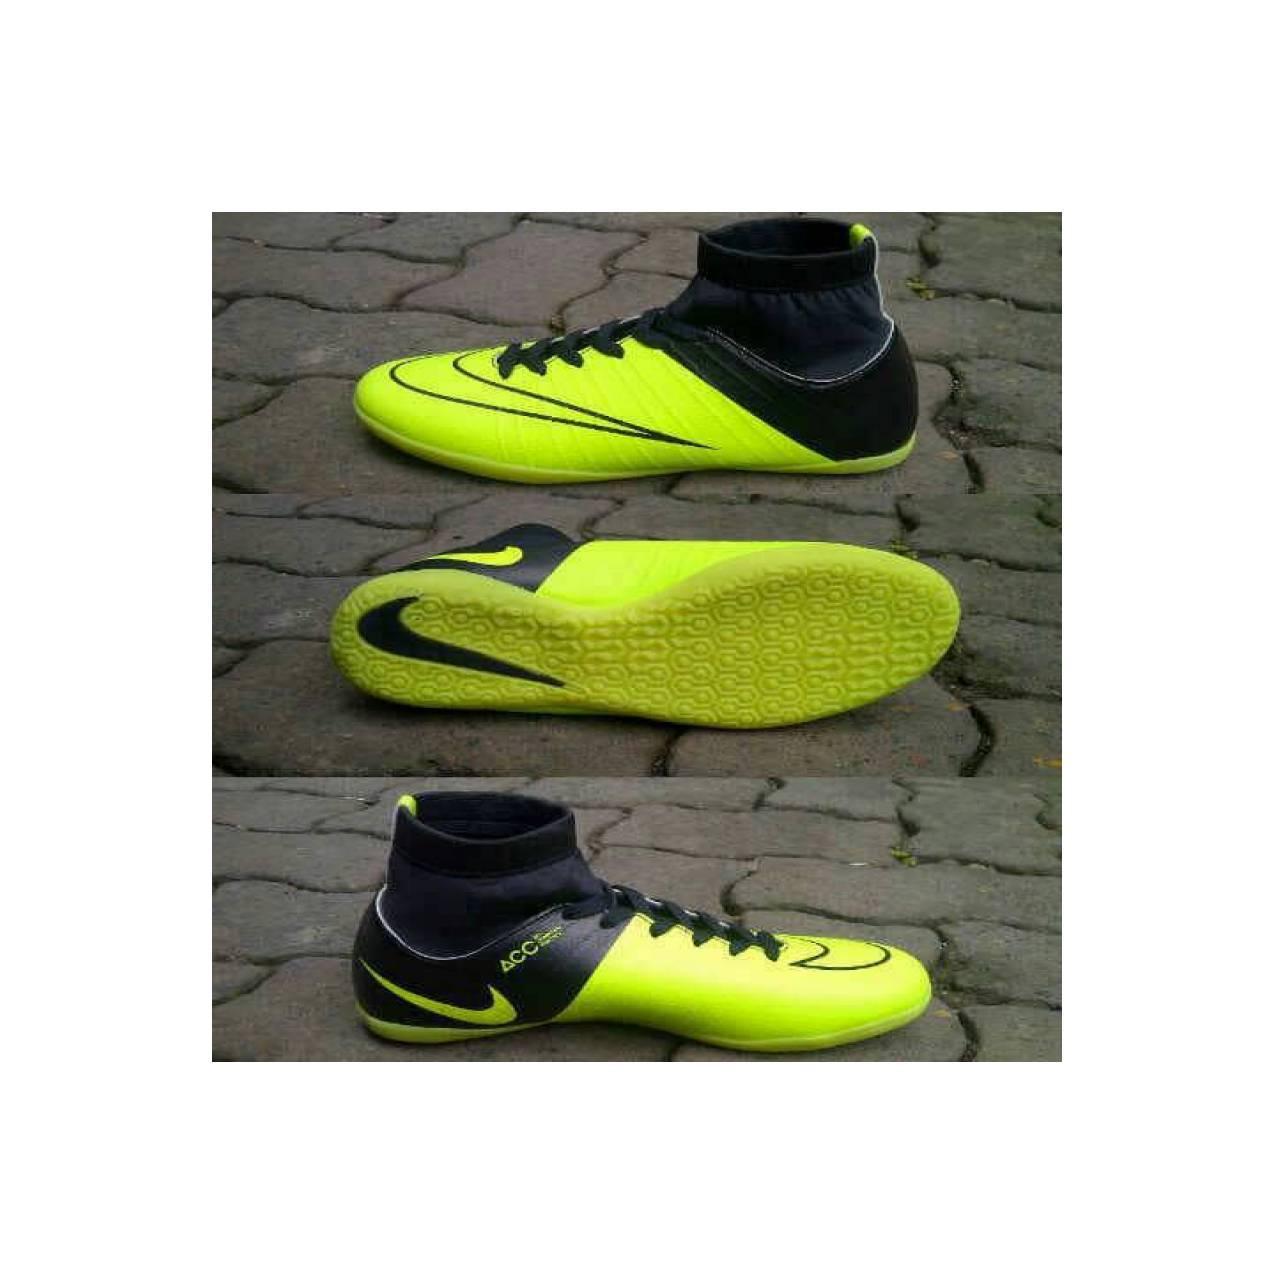 Promo Sepatu Futsal Nike Acc Mercurial Hijau Kombinasi Hitam